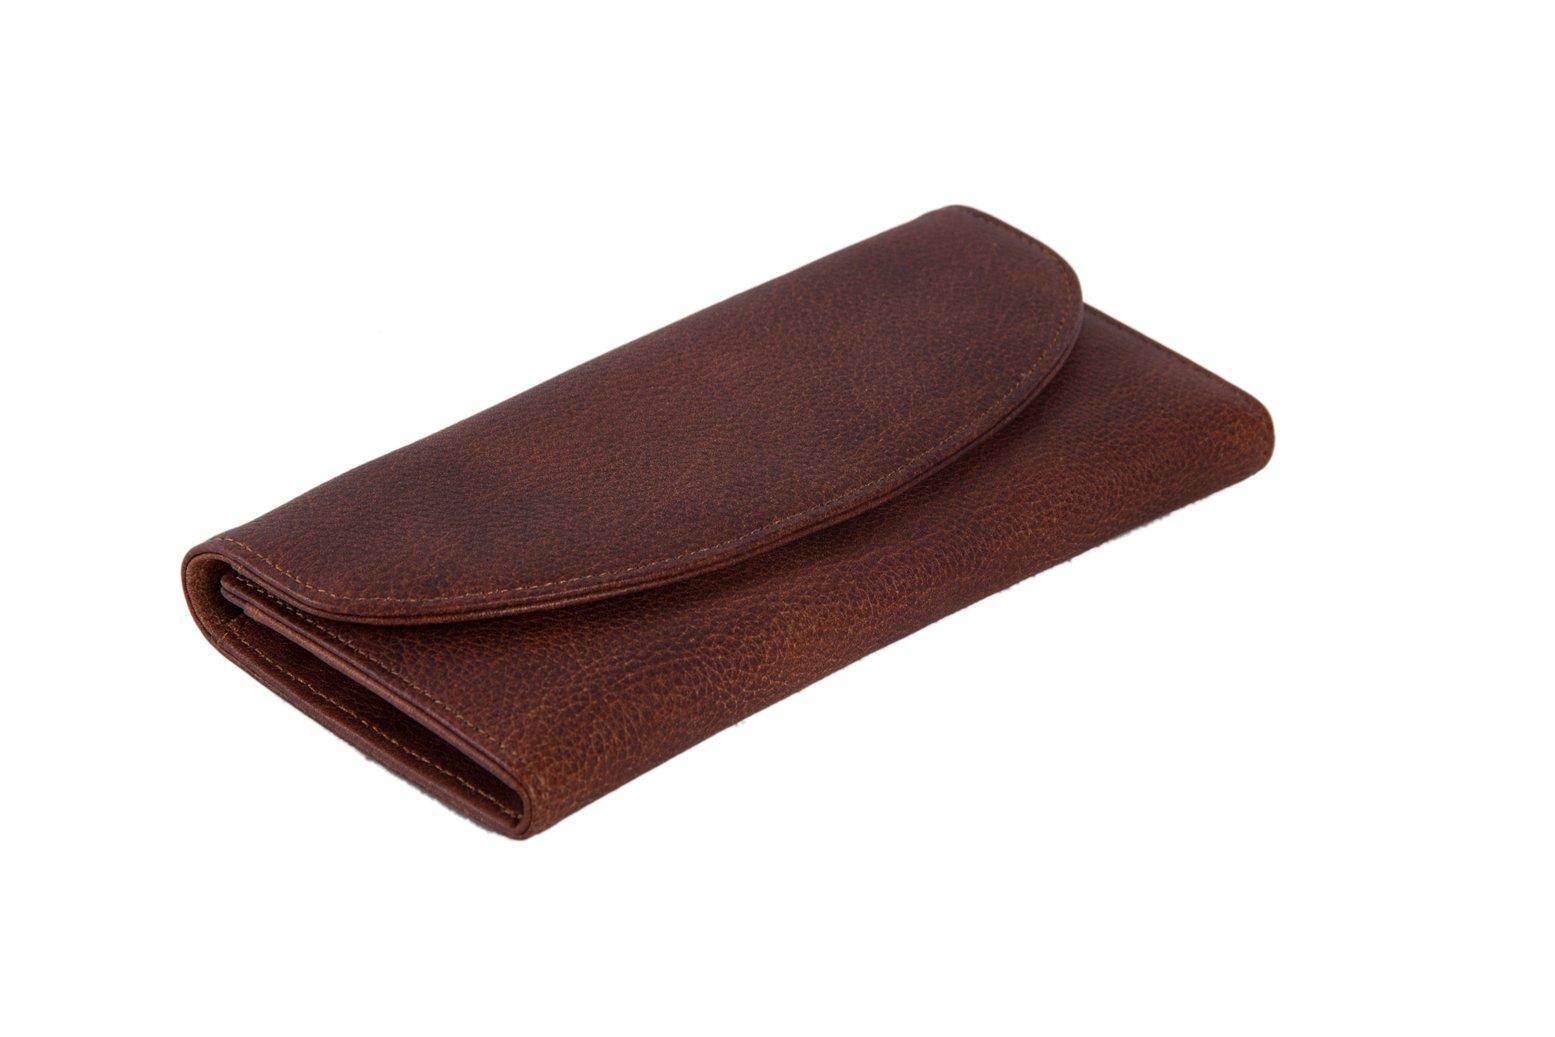 ac8a4055404c MoshiLeatherBag - Handmade Leather Bag Manufacturer — Handcrafted Wholesale Genuine  Leather Wallet Long Wallet Men Wallet Card Holder 9066